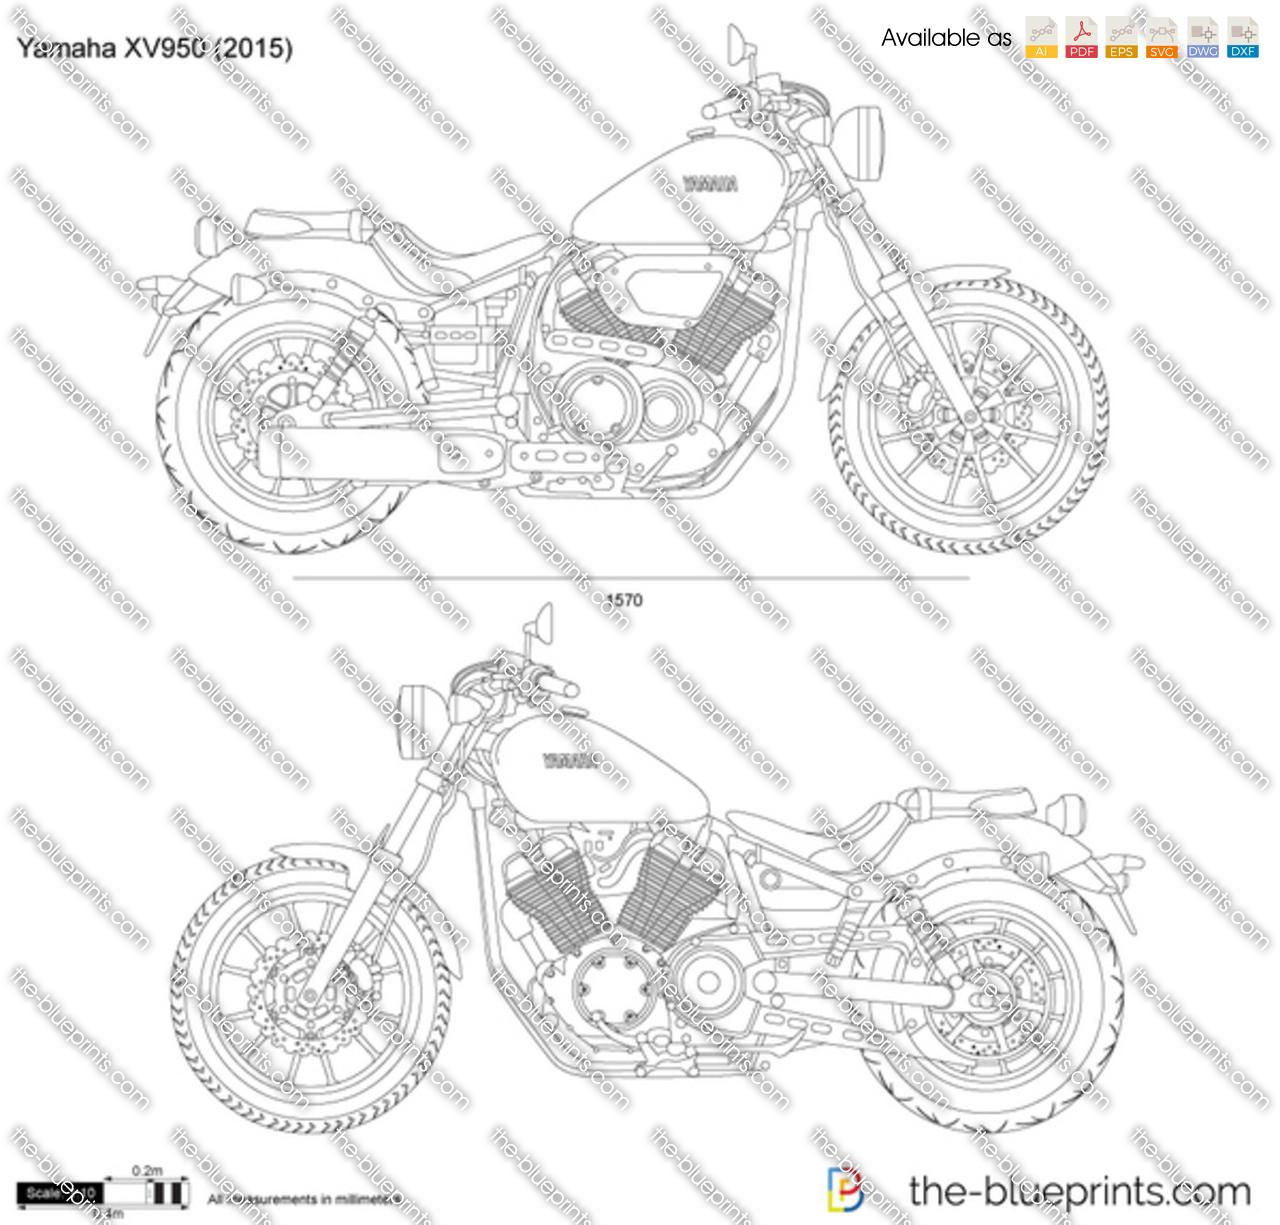 Yamaha XV950 2017